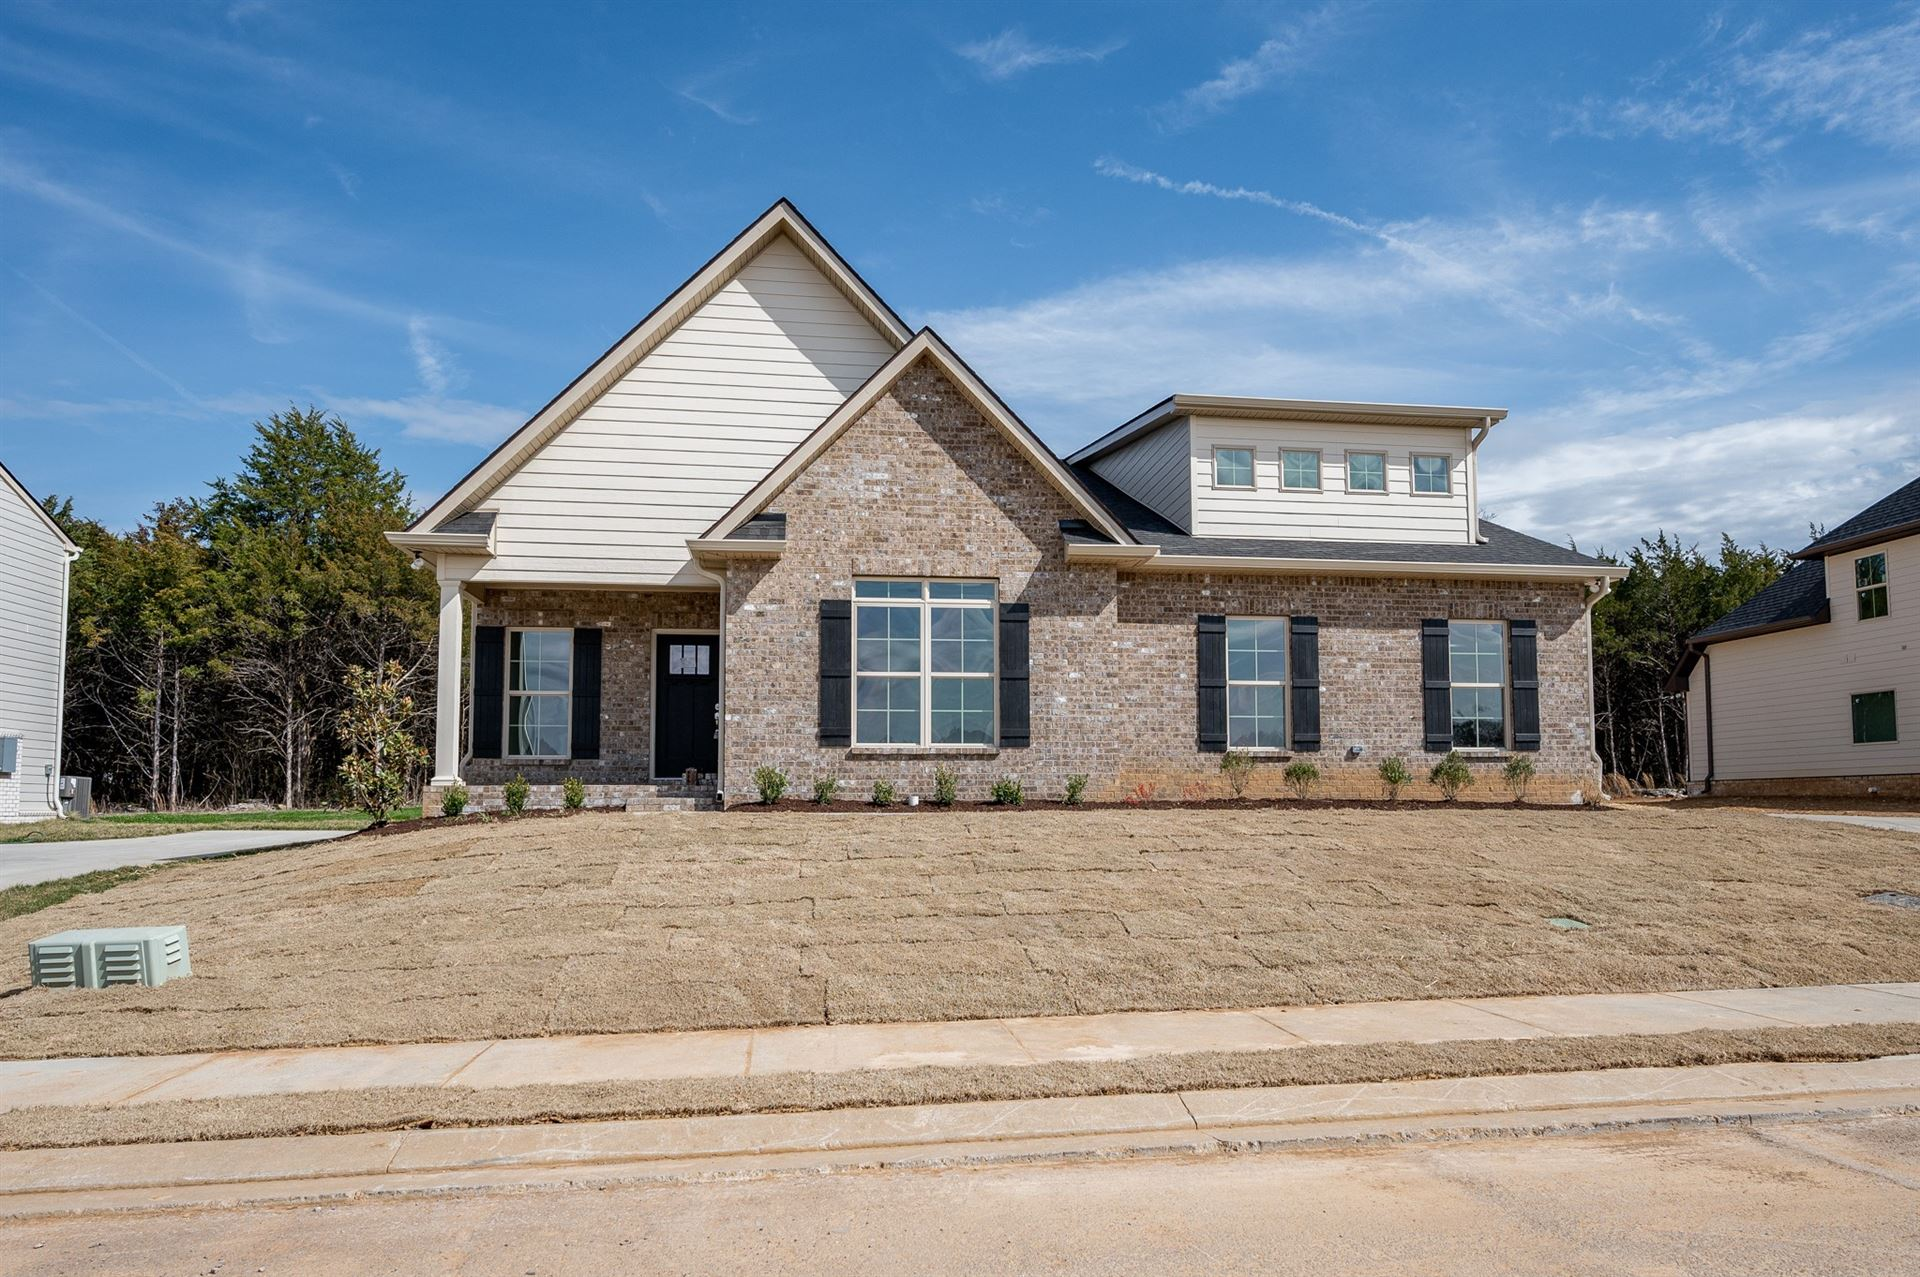 2432 Sandstone Circle, Murfreesboro, TN 37130 - MLS#: 2244850